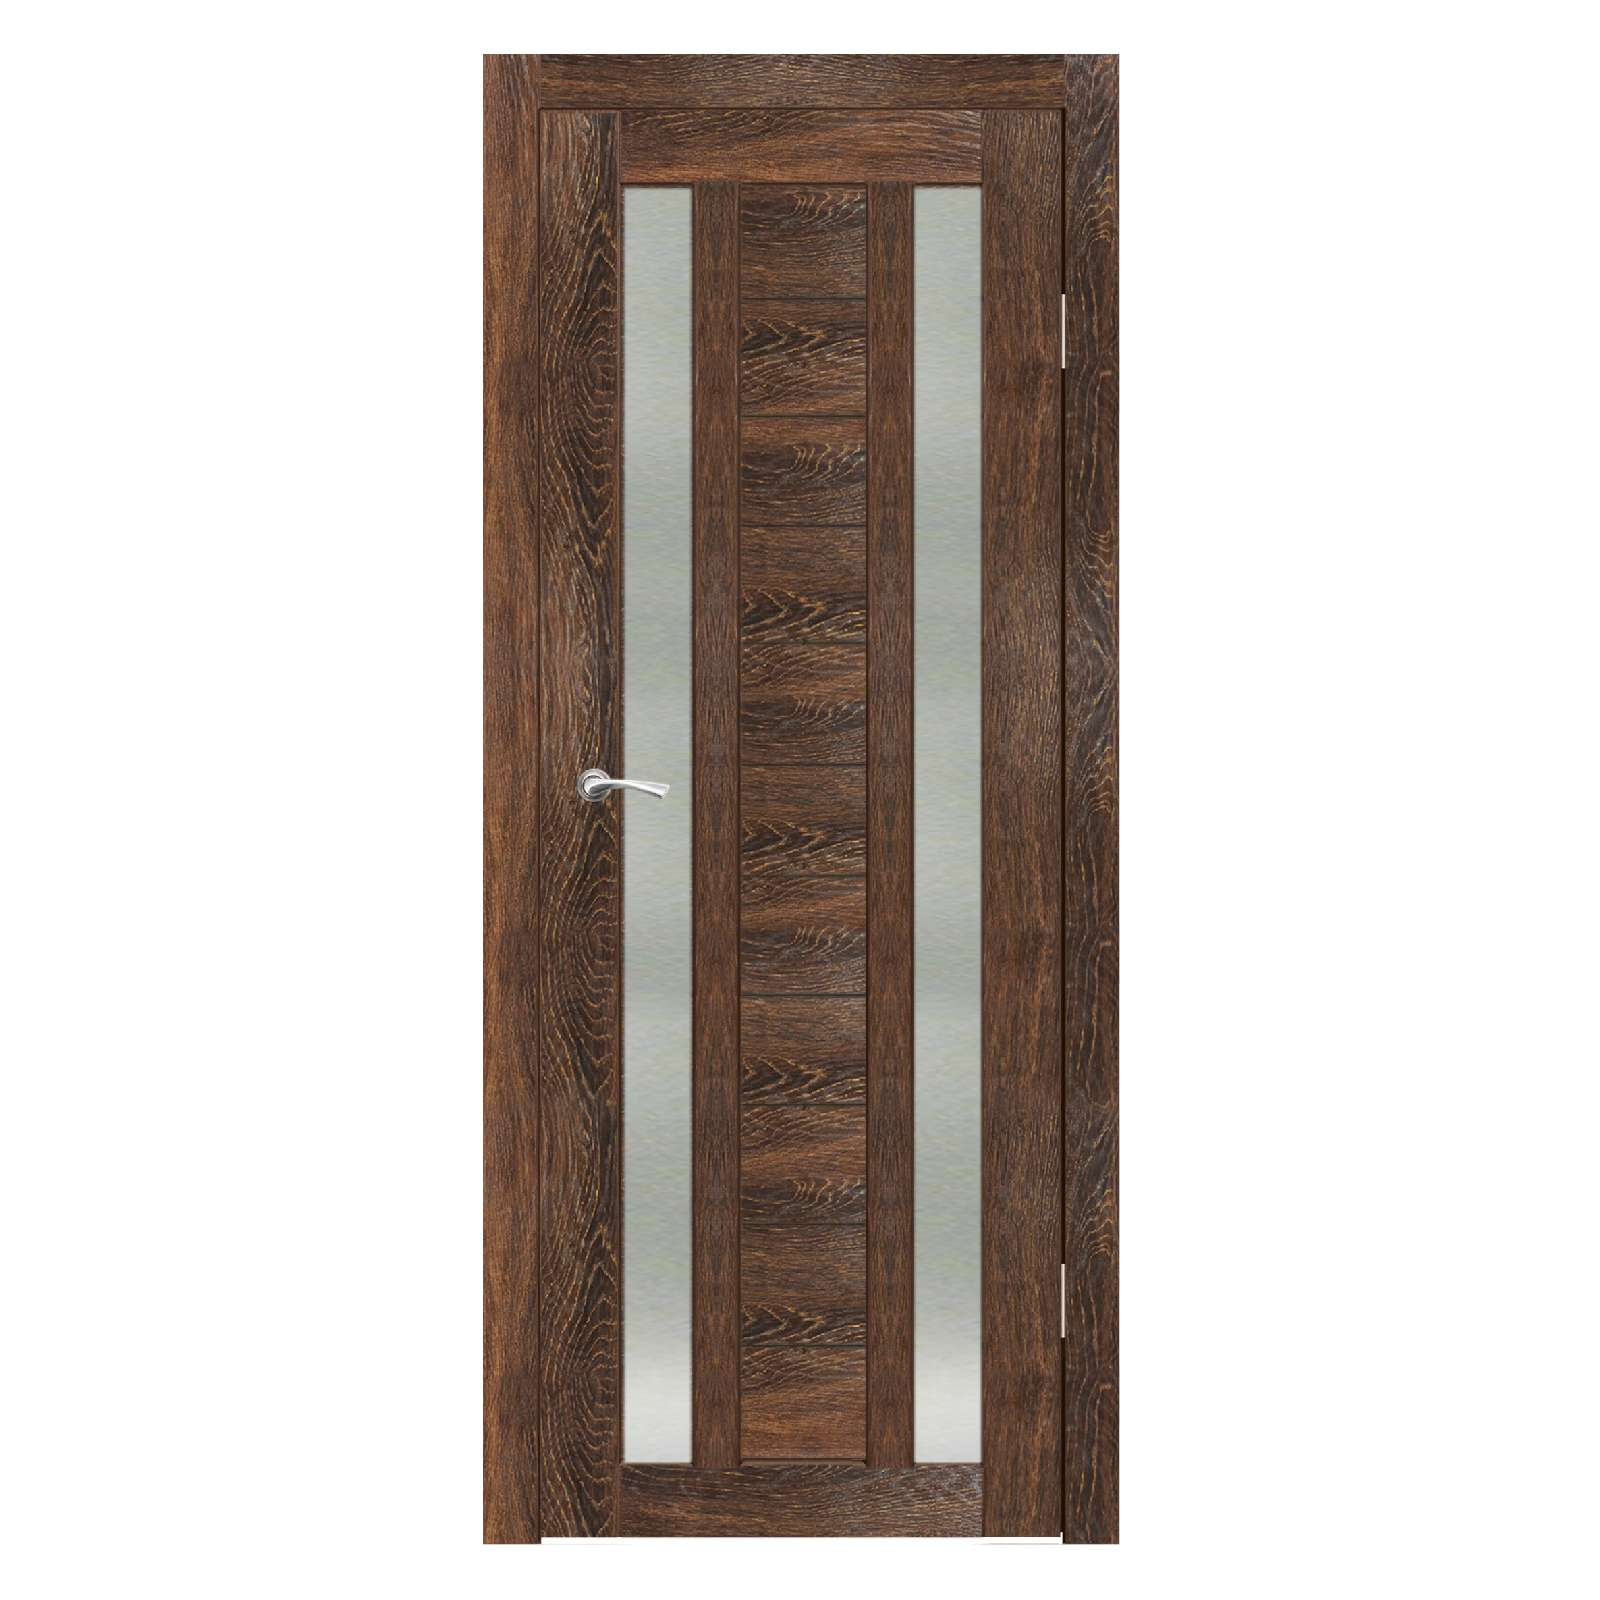 Дверное полотно Синержи Фиеста, Виски, ПДО 700Х2000ММ